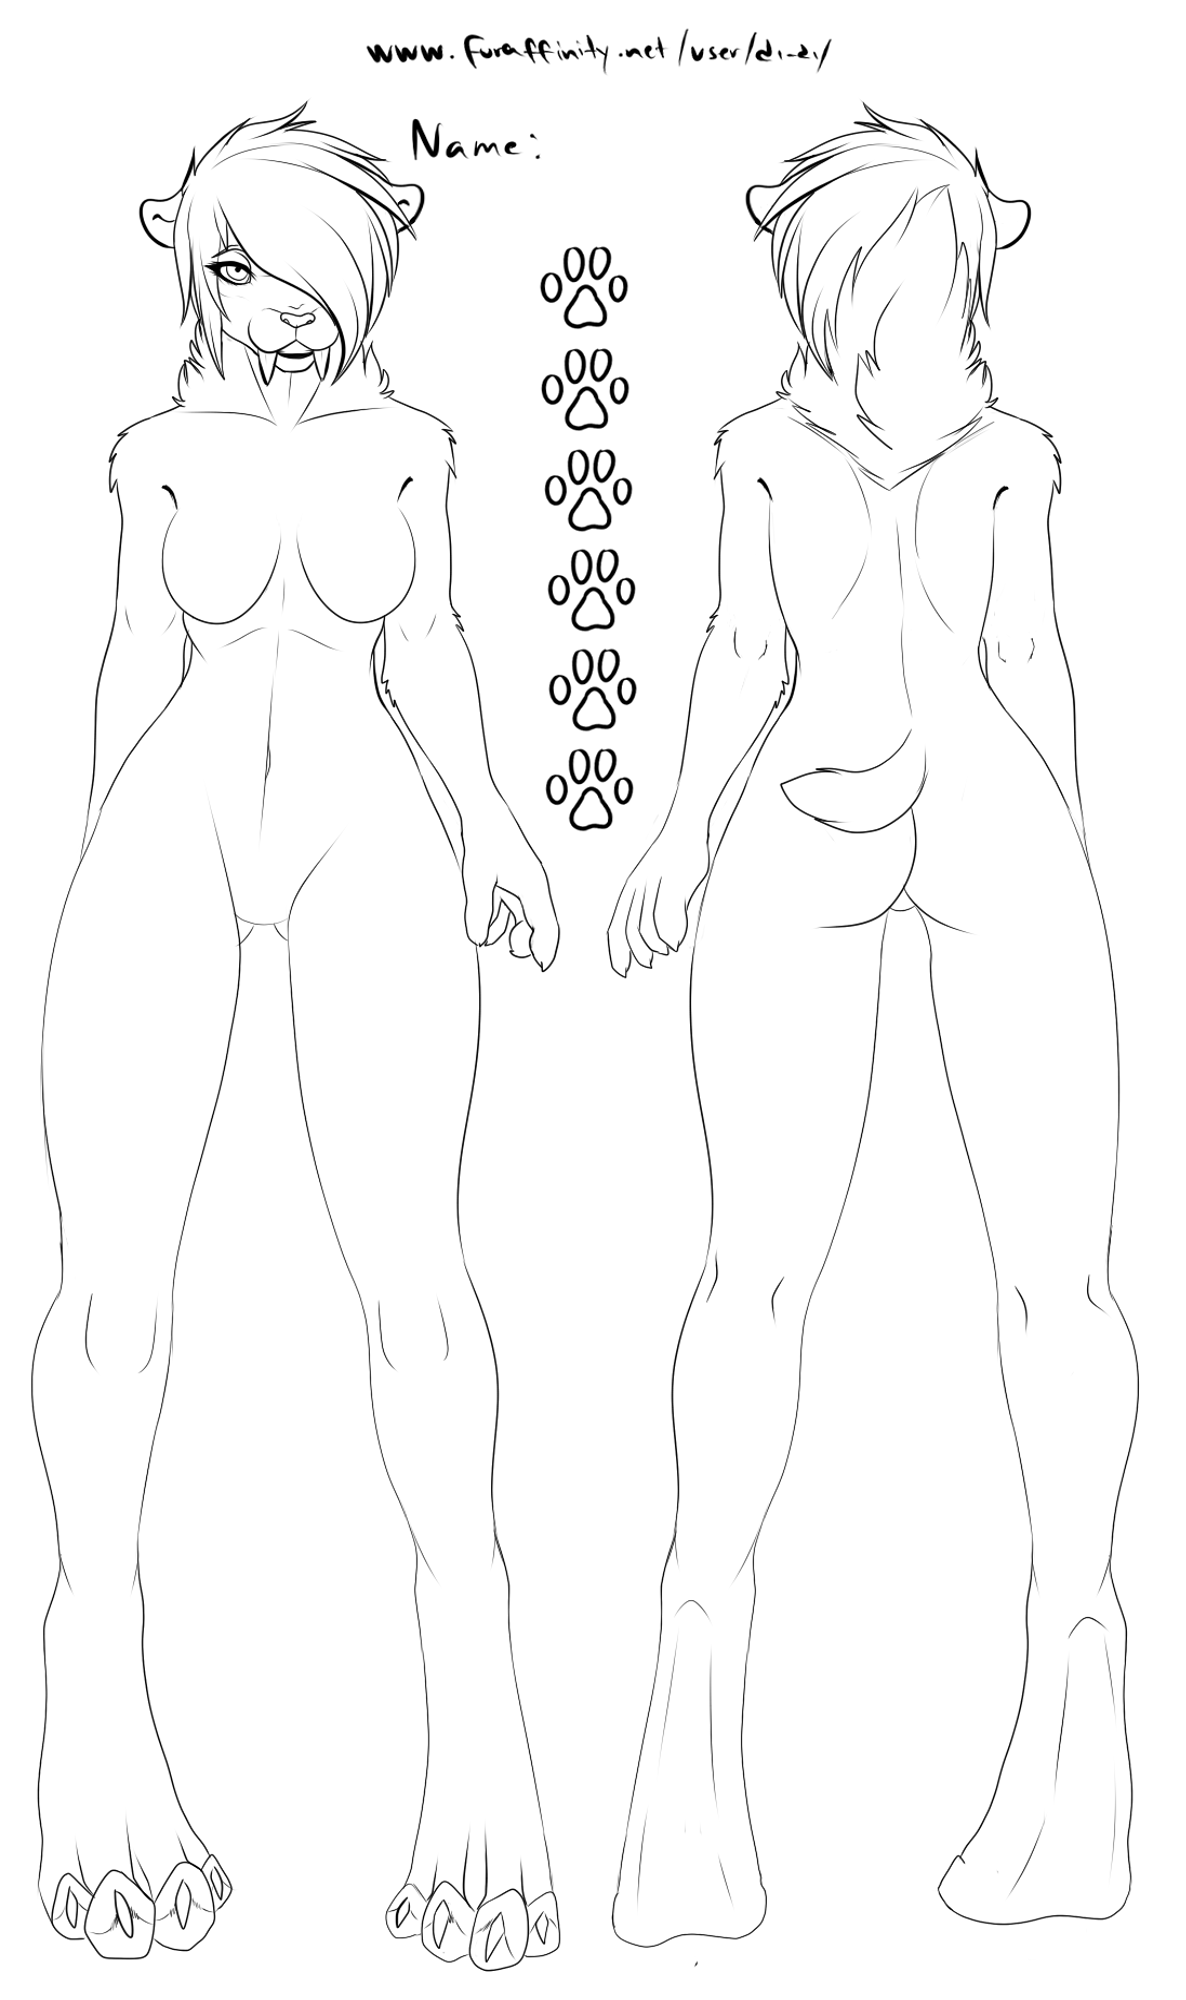 jpg black and white stock Free sabertooth ref female. Drawing females